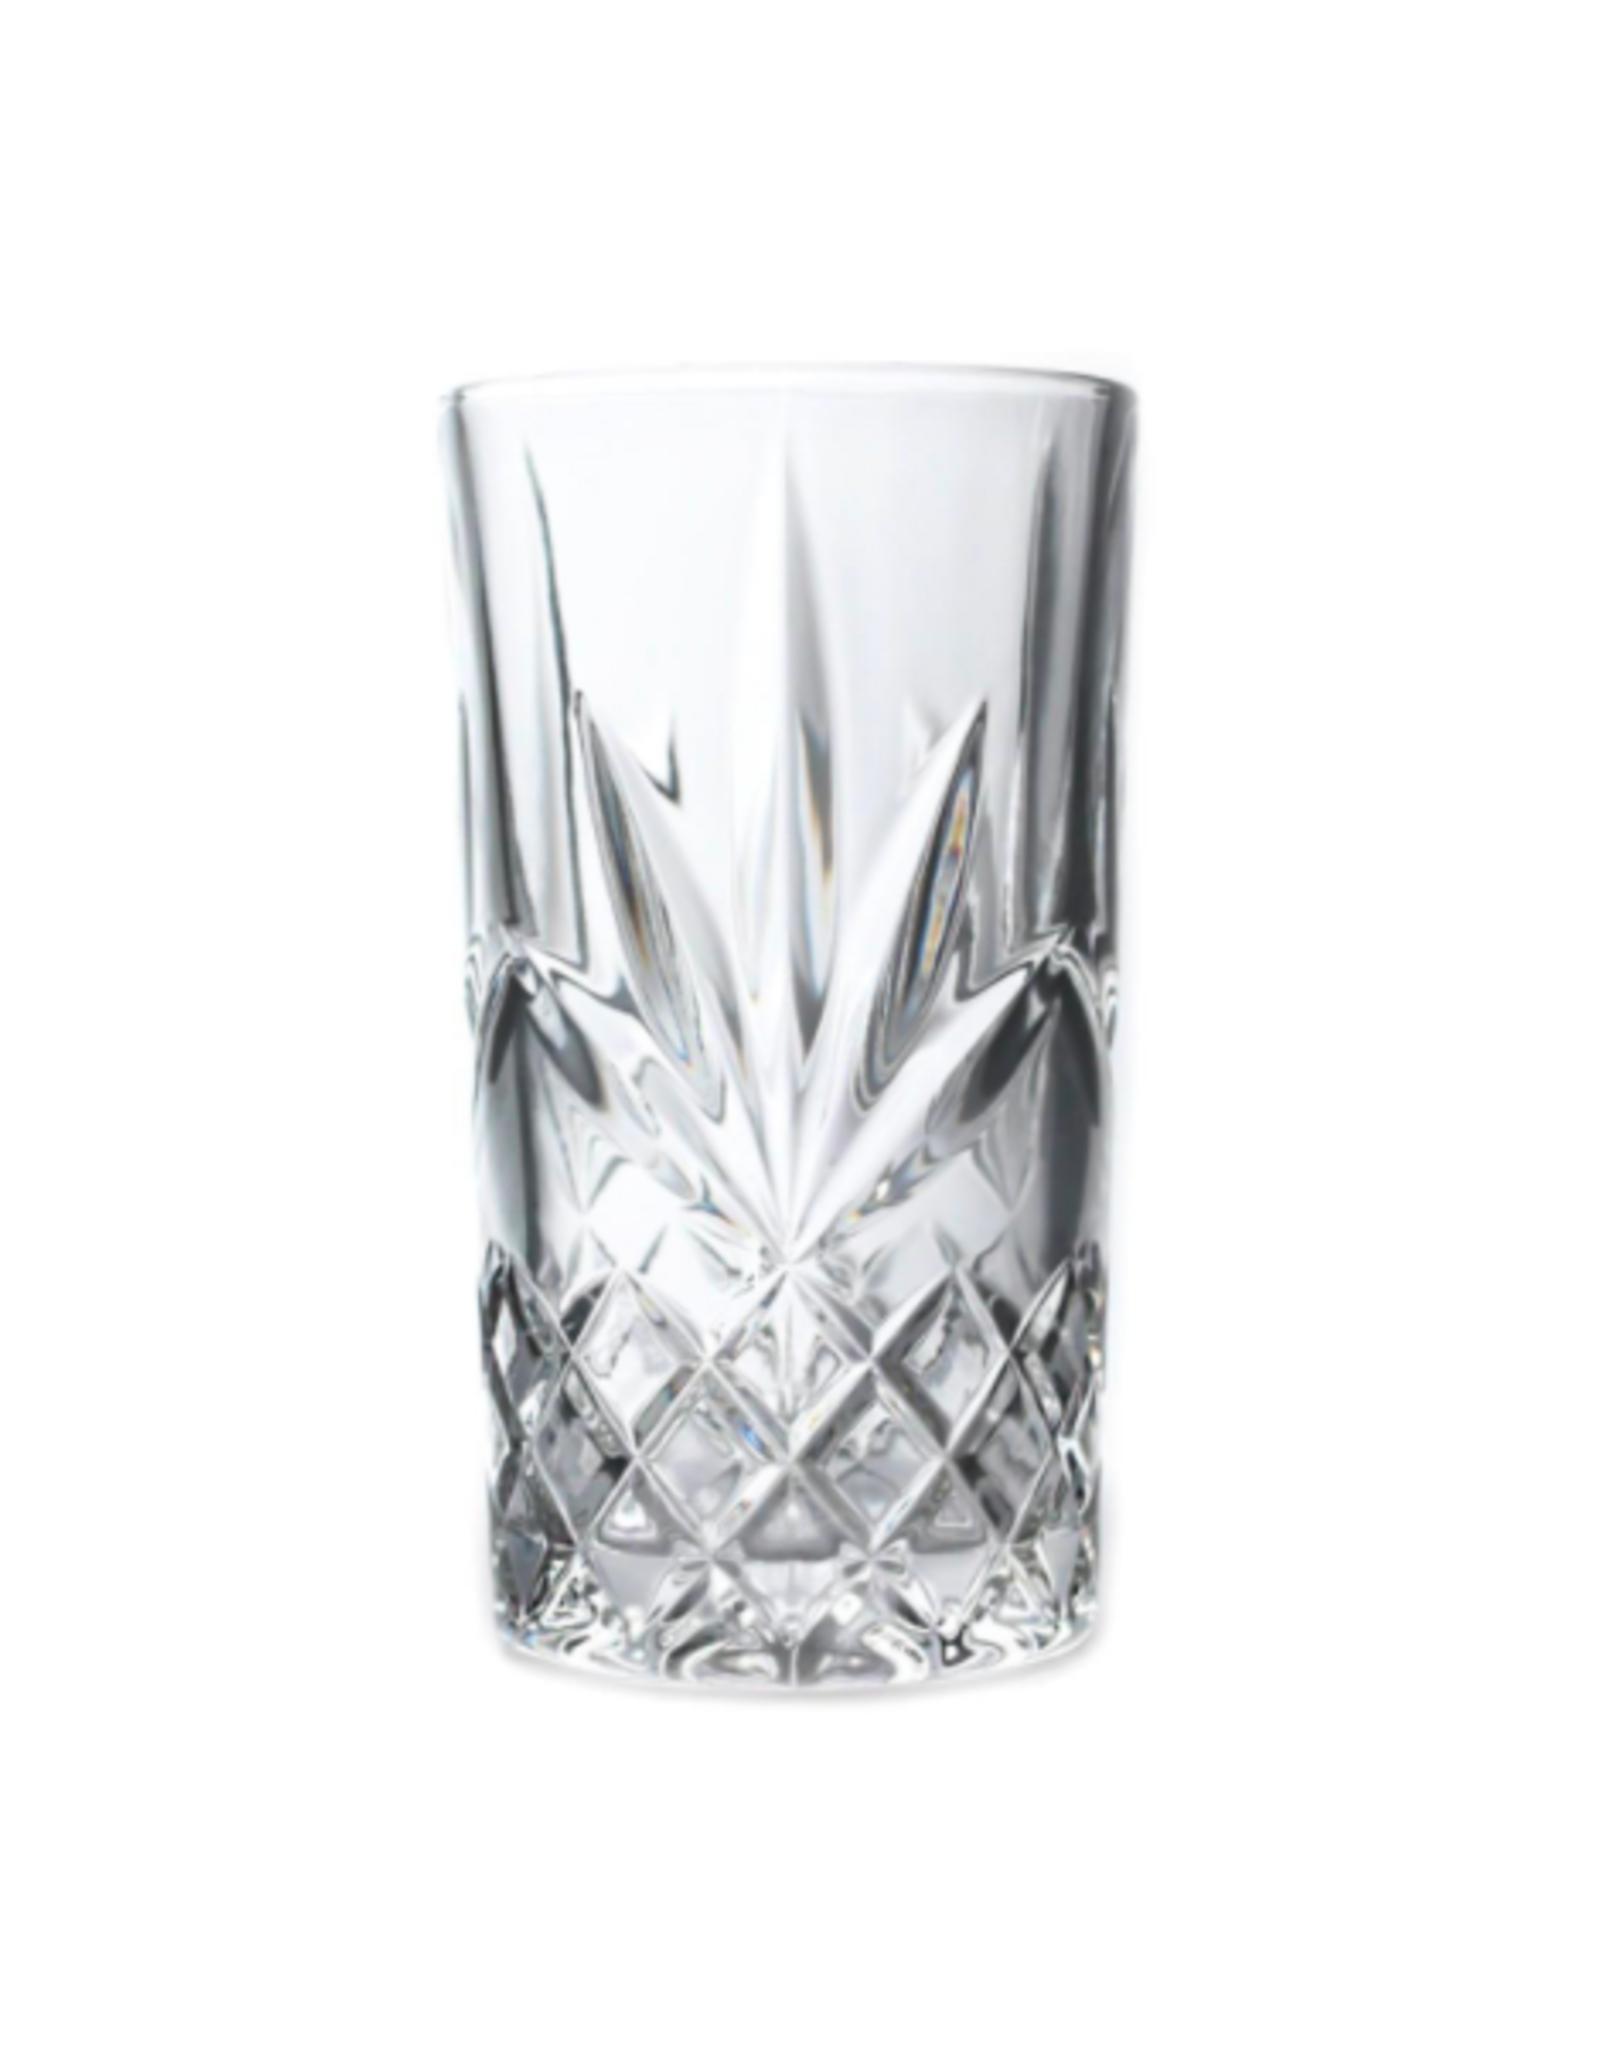 JMI - Palm Springs Highball / Glass, 12oz